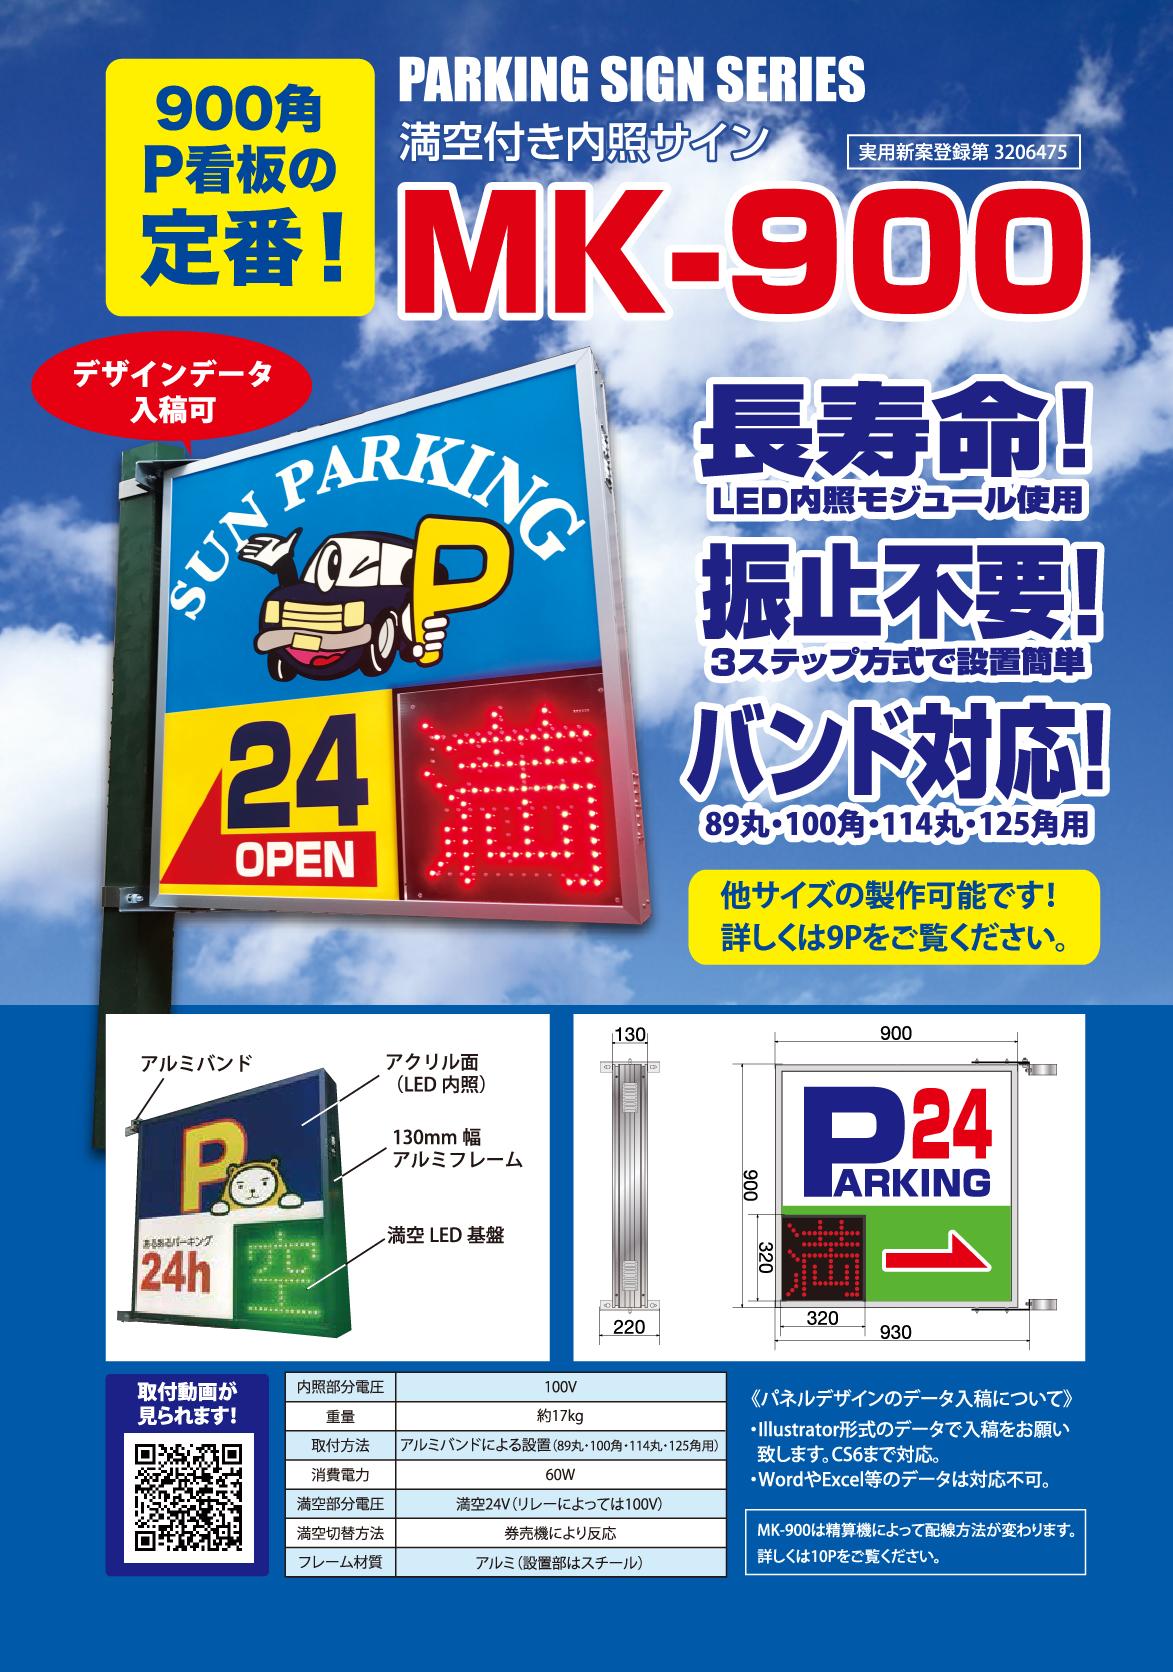 MK-900 満空付き内照式サインの紹介画像です